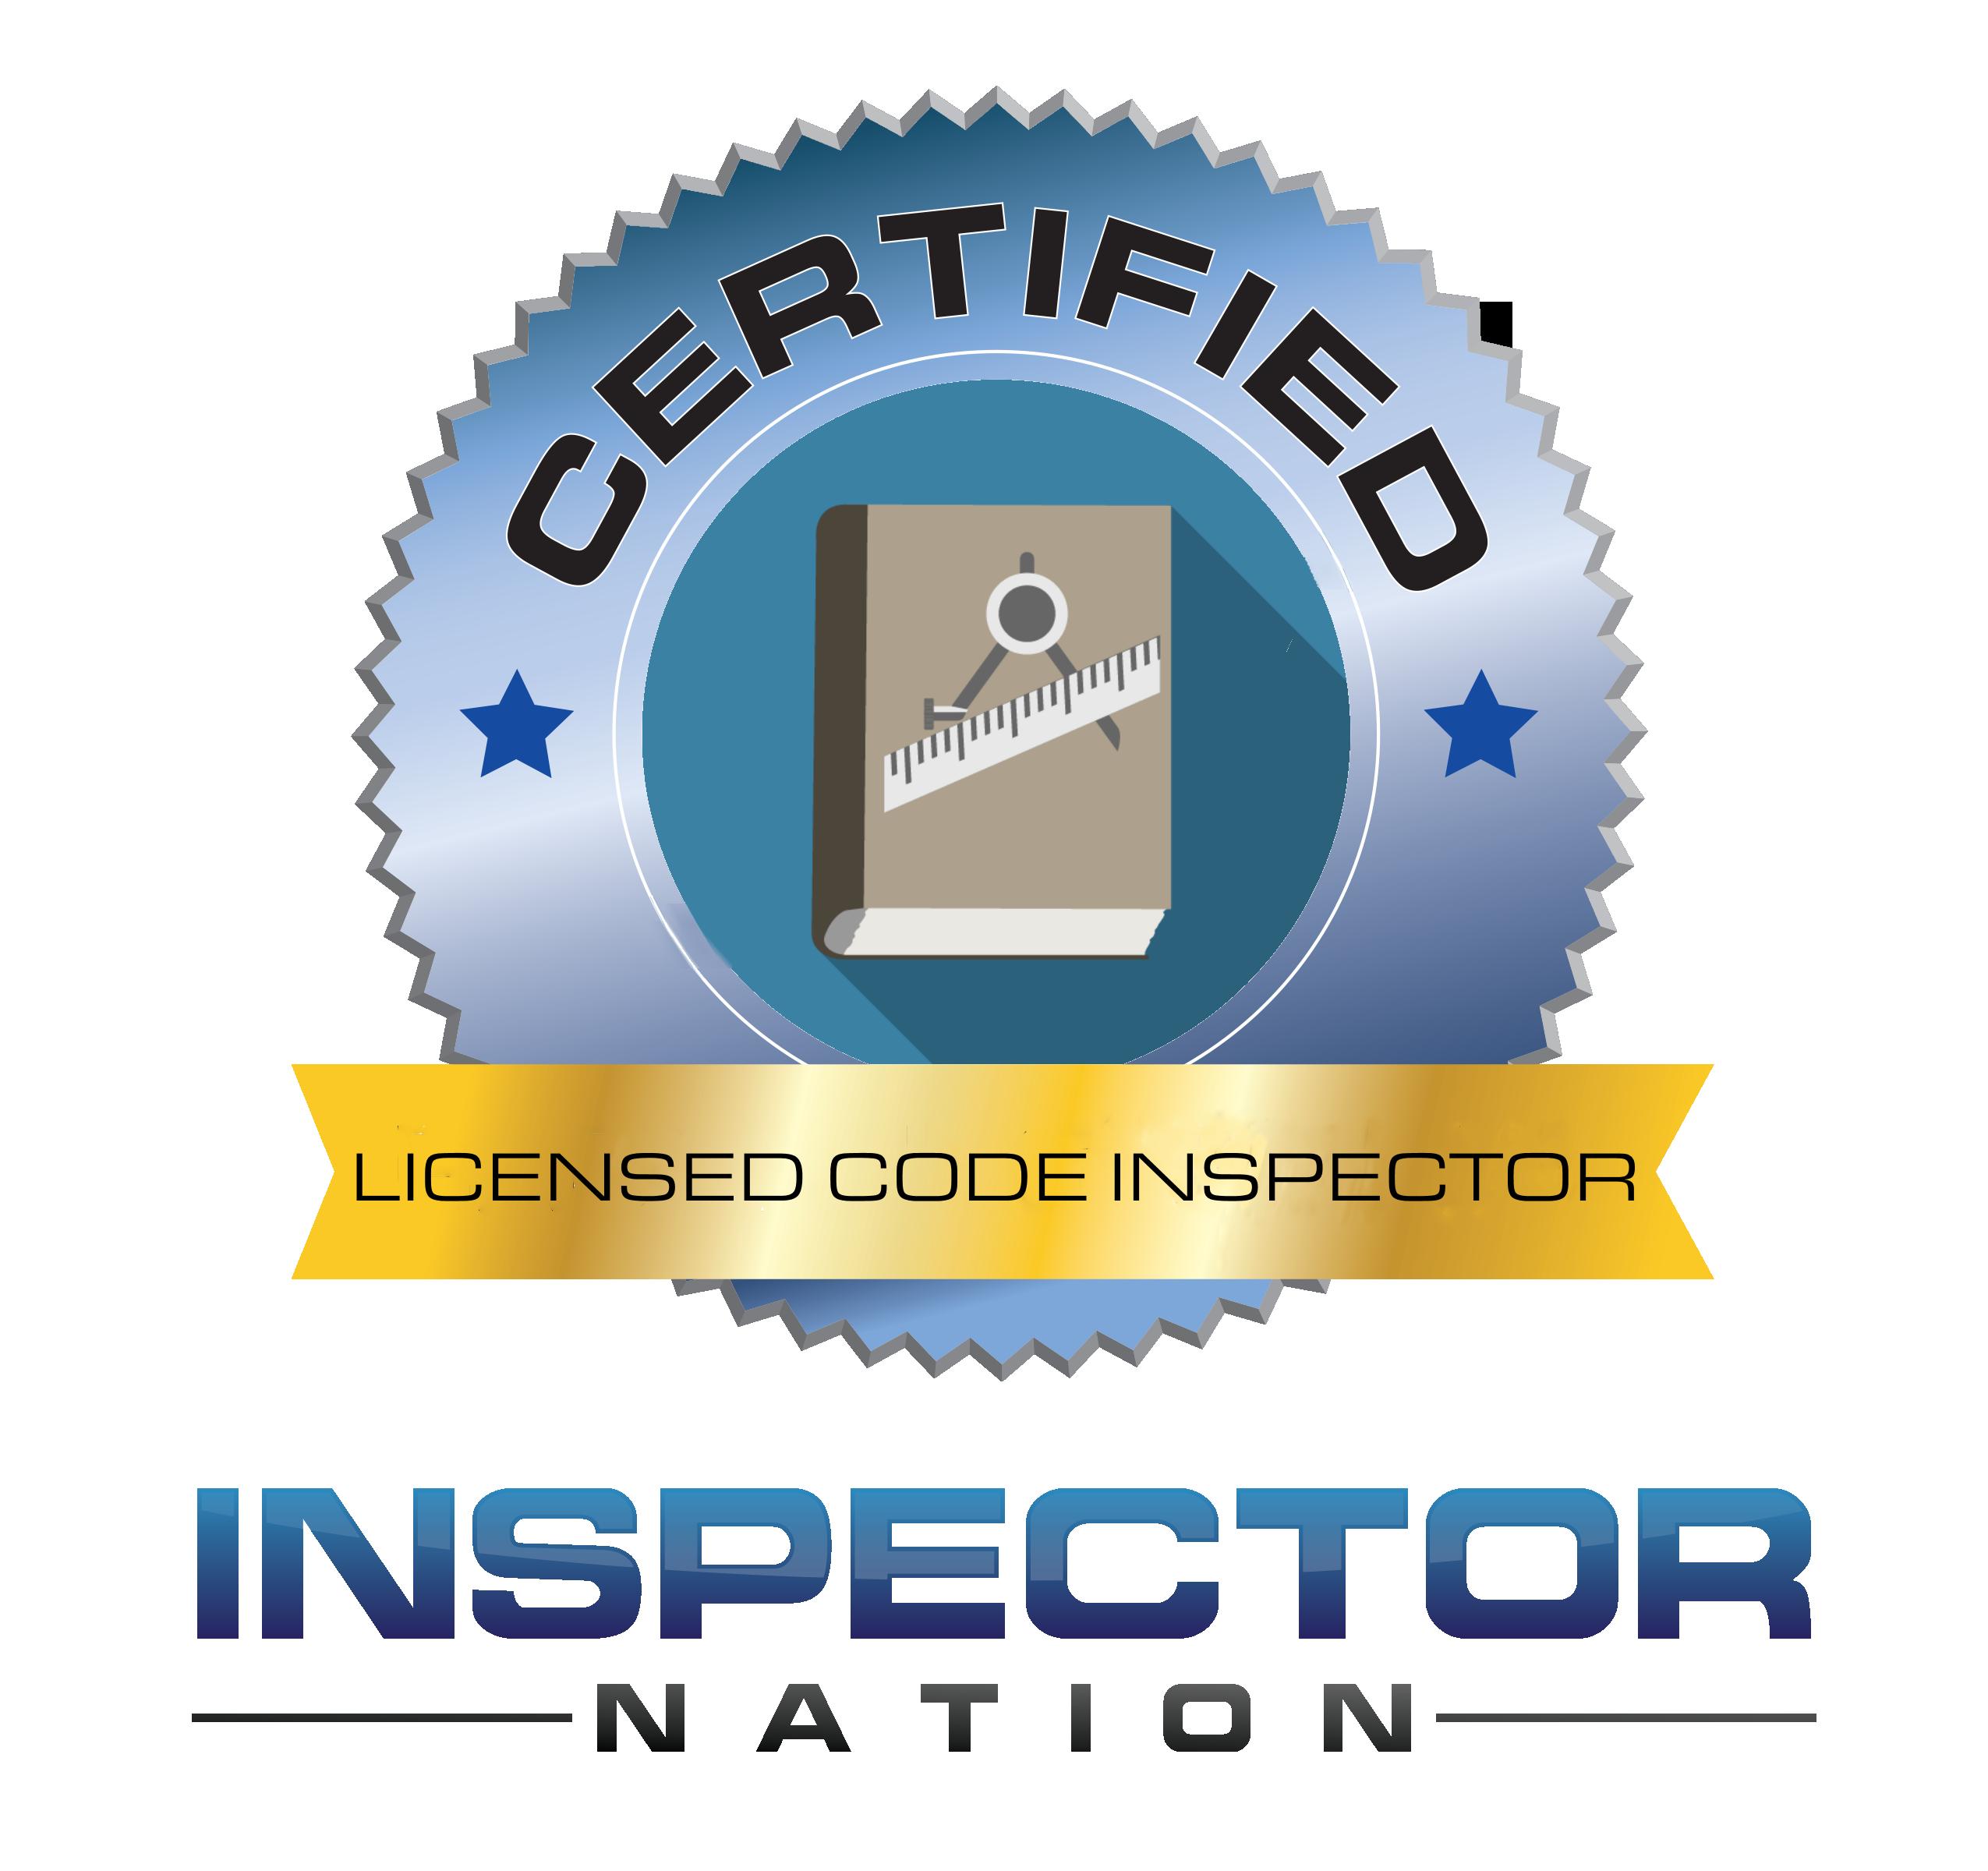 licensed building code inspector inspector nation certified home inspector badge emblem icon